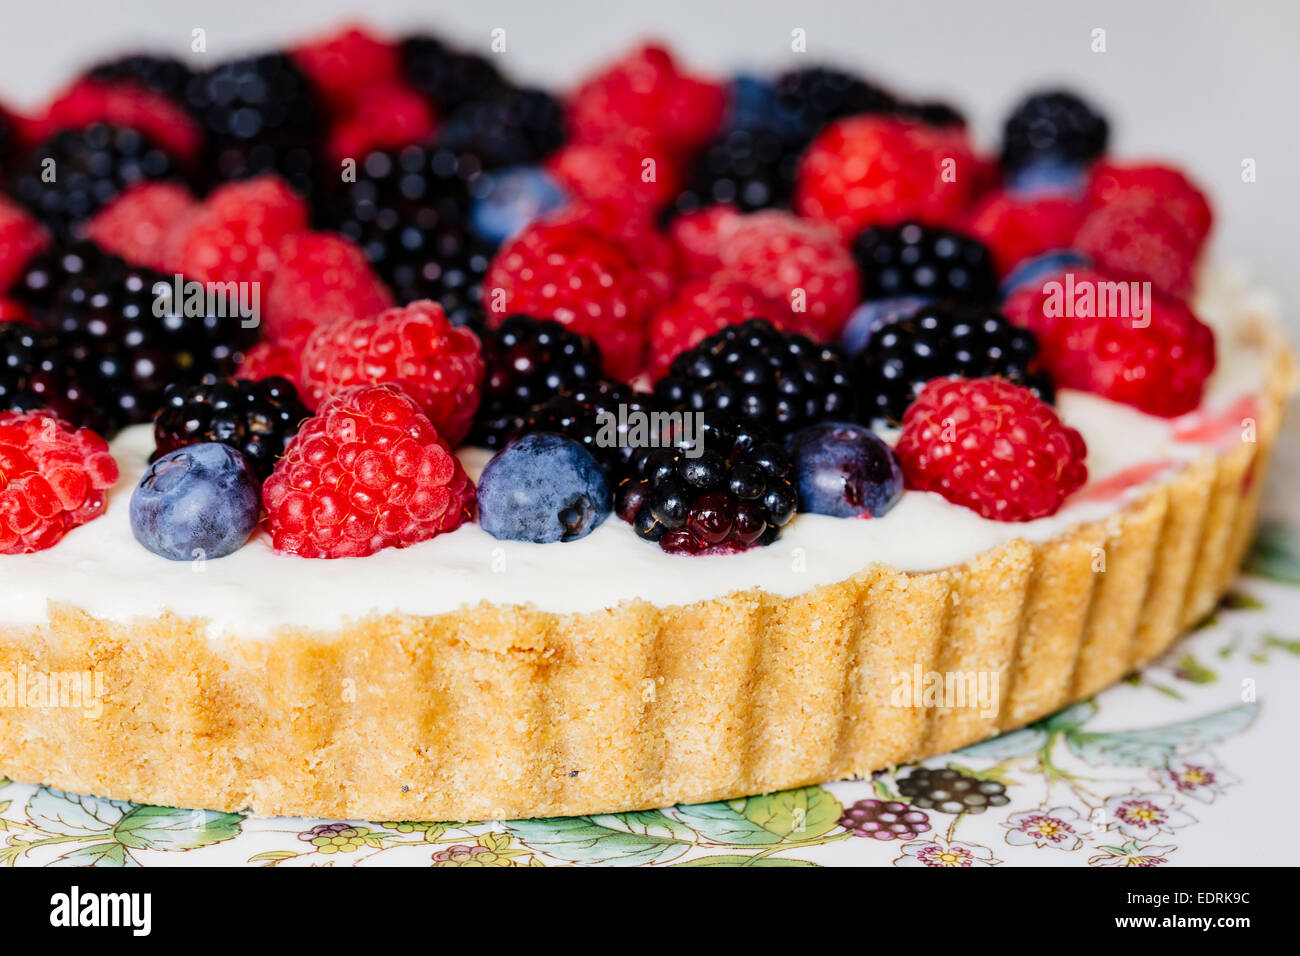 Berry and mascarpone tart - Stock Image